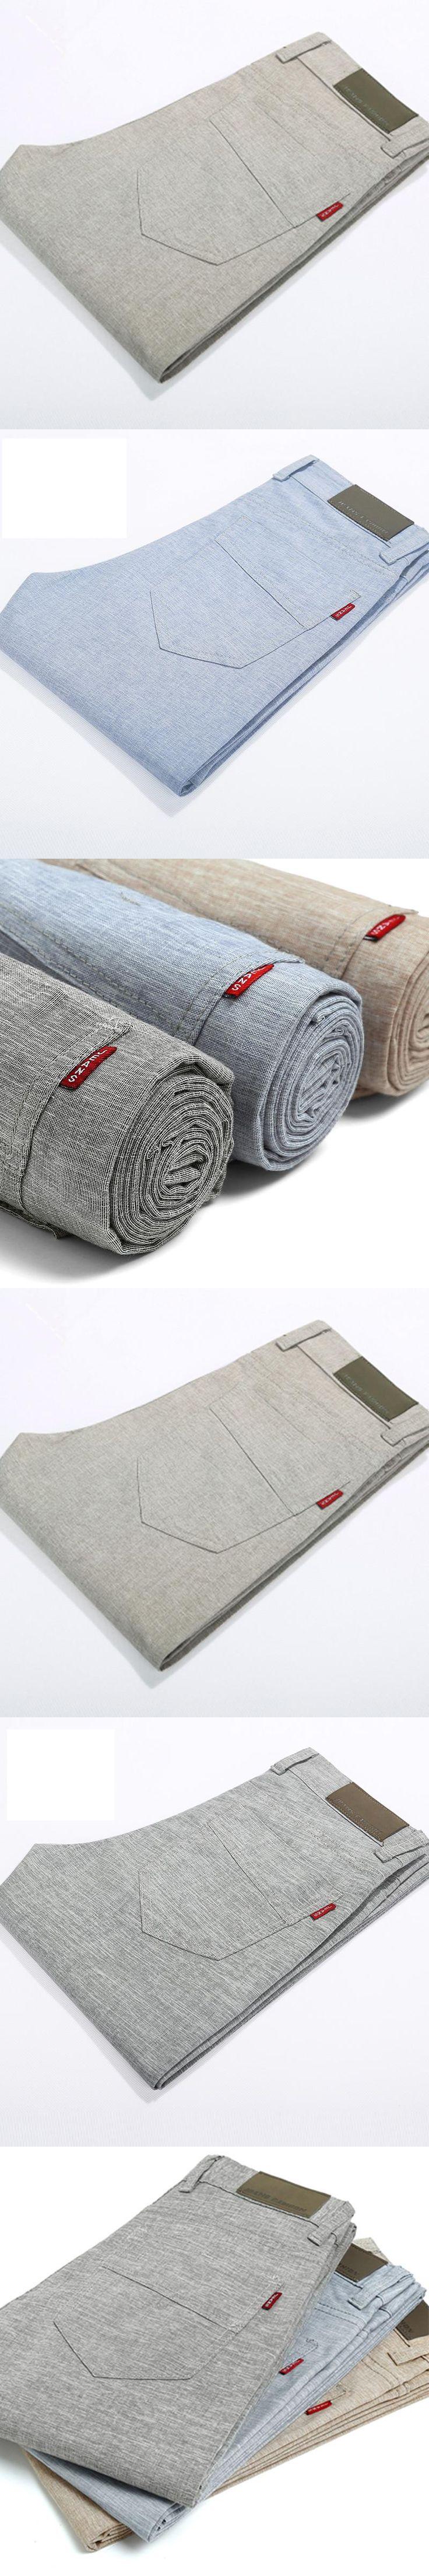 2017 high quality Men's Linen Pants men Casual summer breathing thin trousers Men's male Straight long Slim Fit pants Plus Size